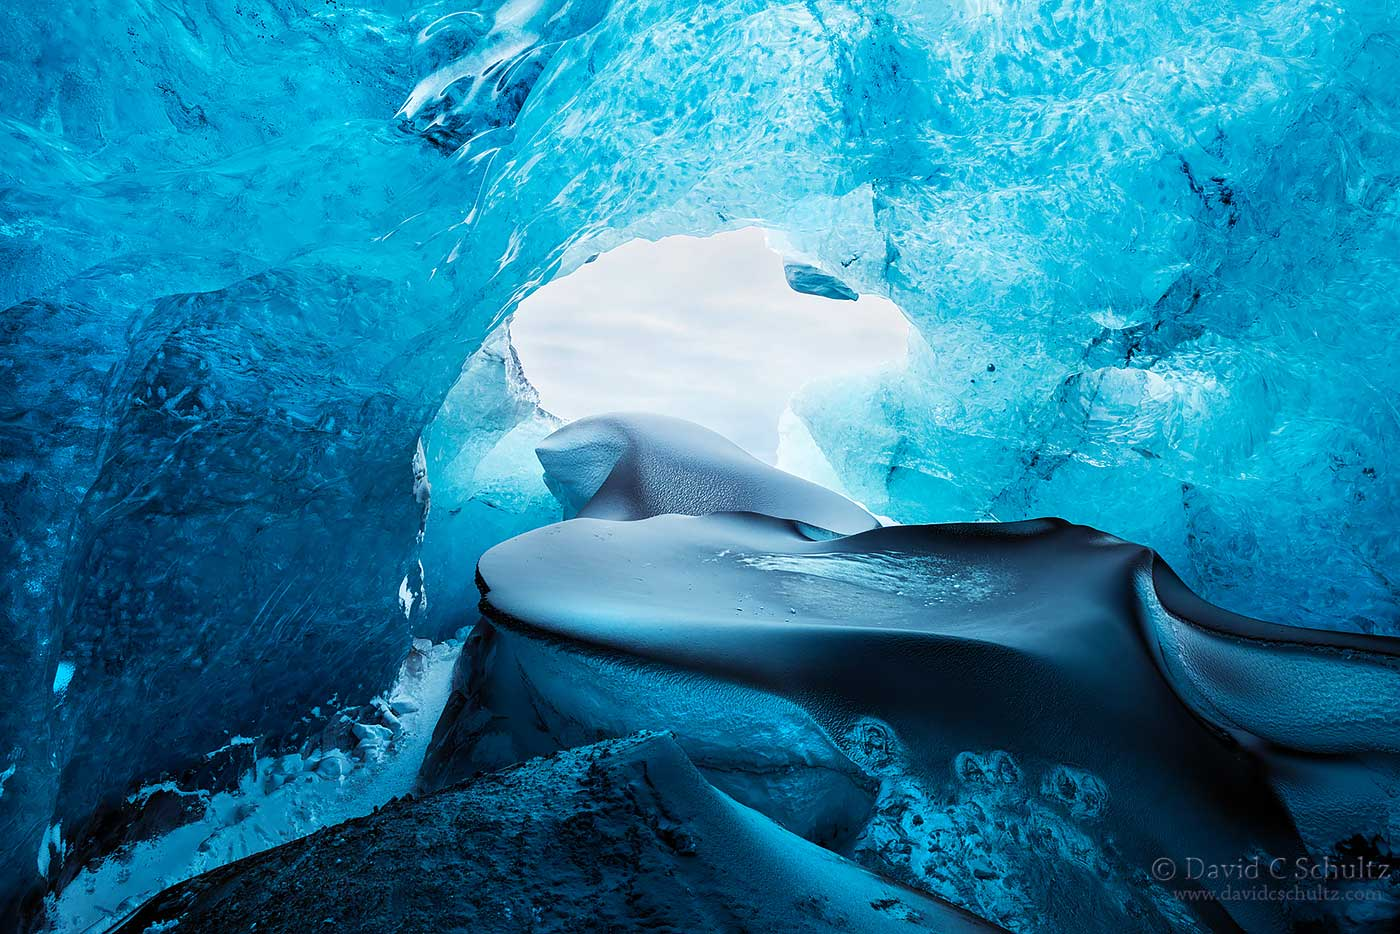 Iceland ice cave - Image #211-1500